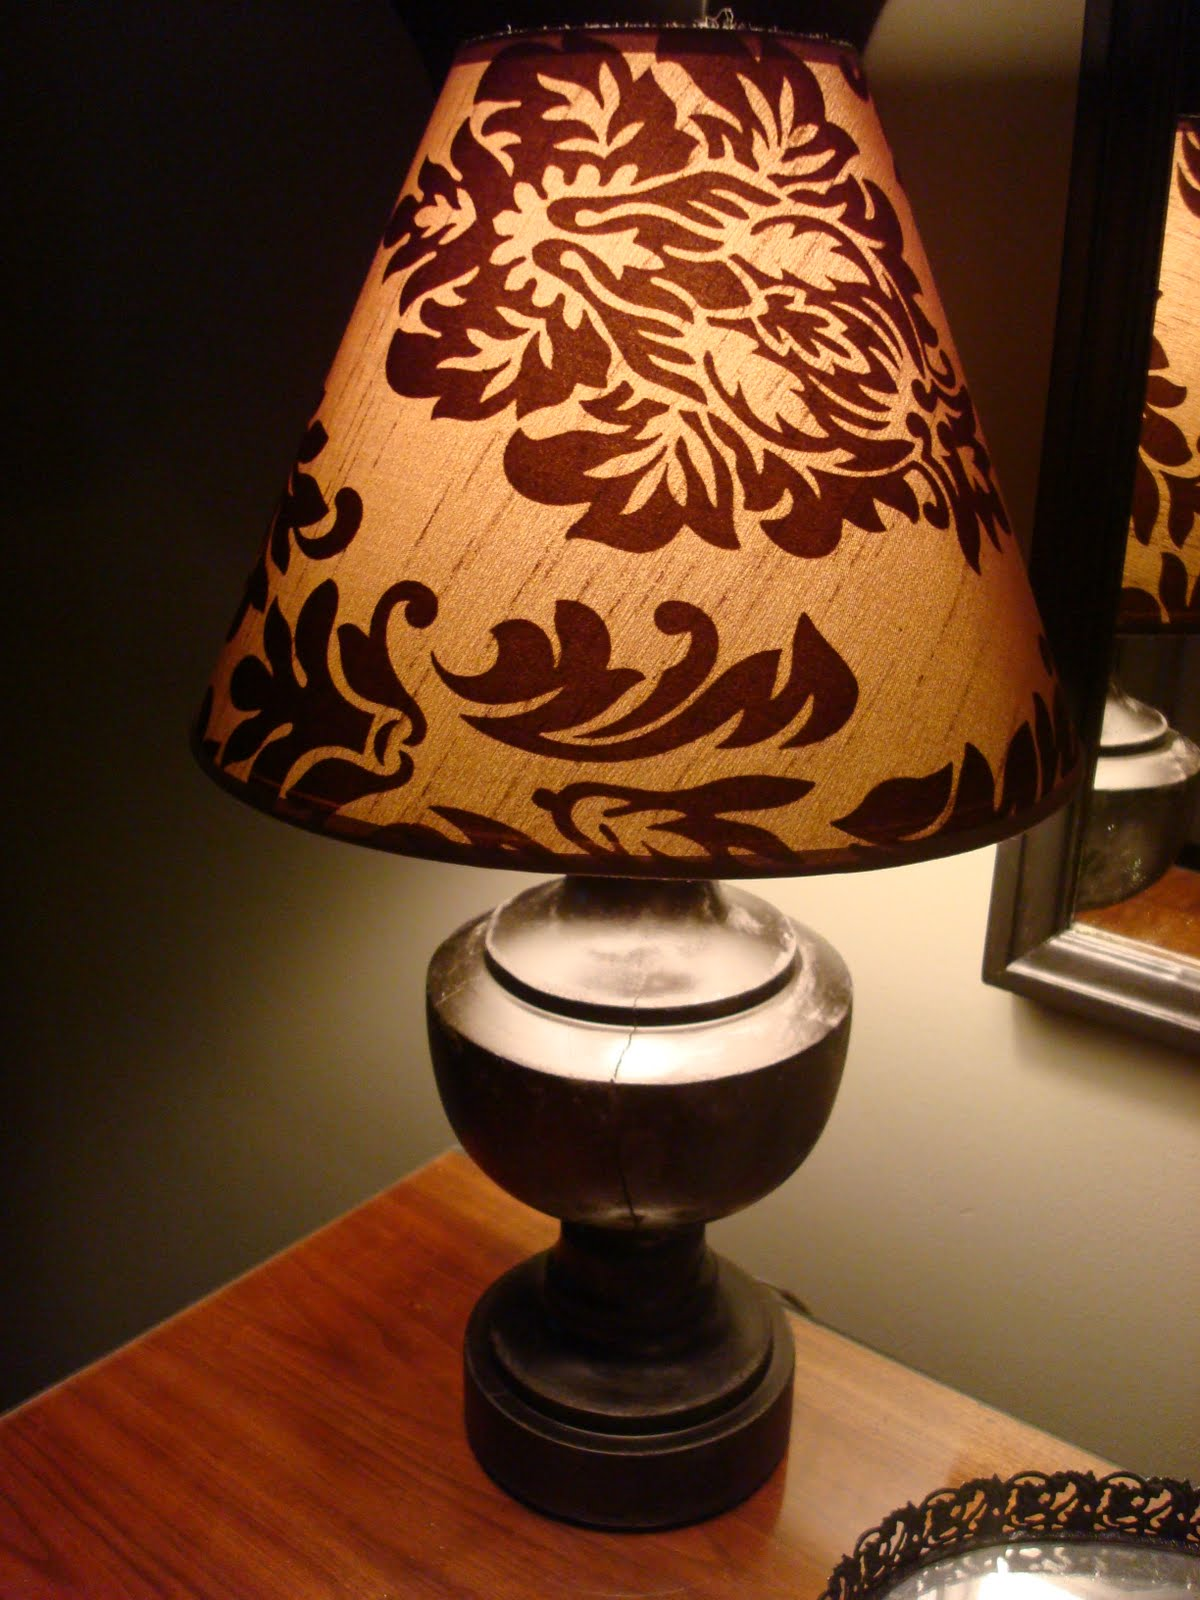 oil rubbed bronze paint lamp